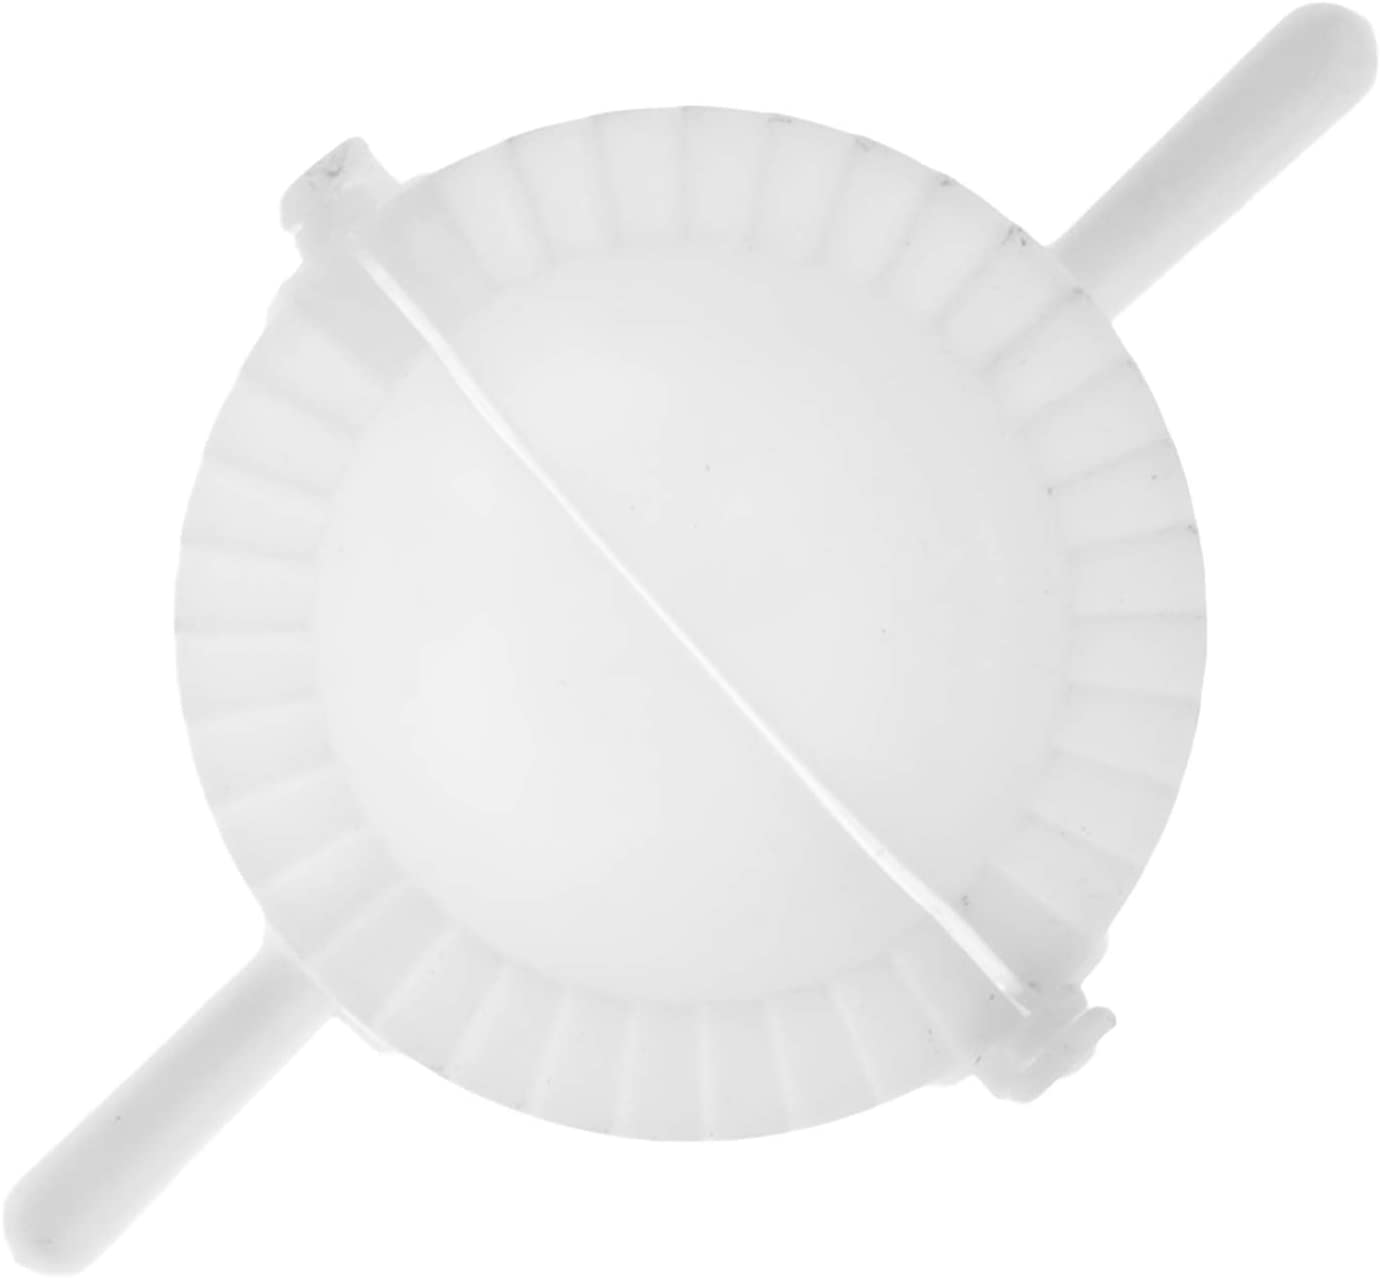 Mini Plastic Dumpling Fees free Press Maker - Dumplings Max 76% OFF Ravioli and Large